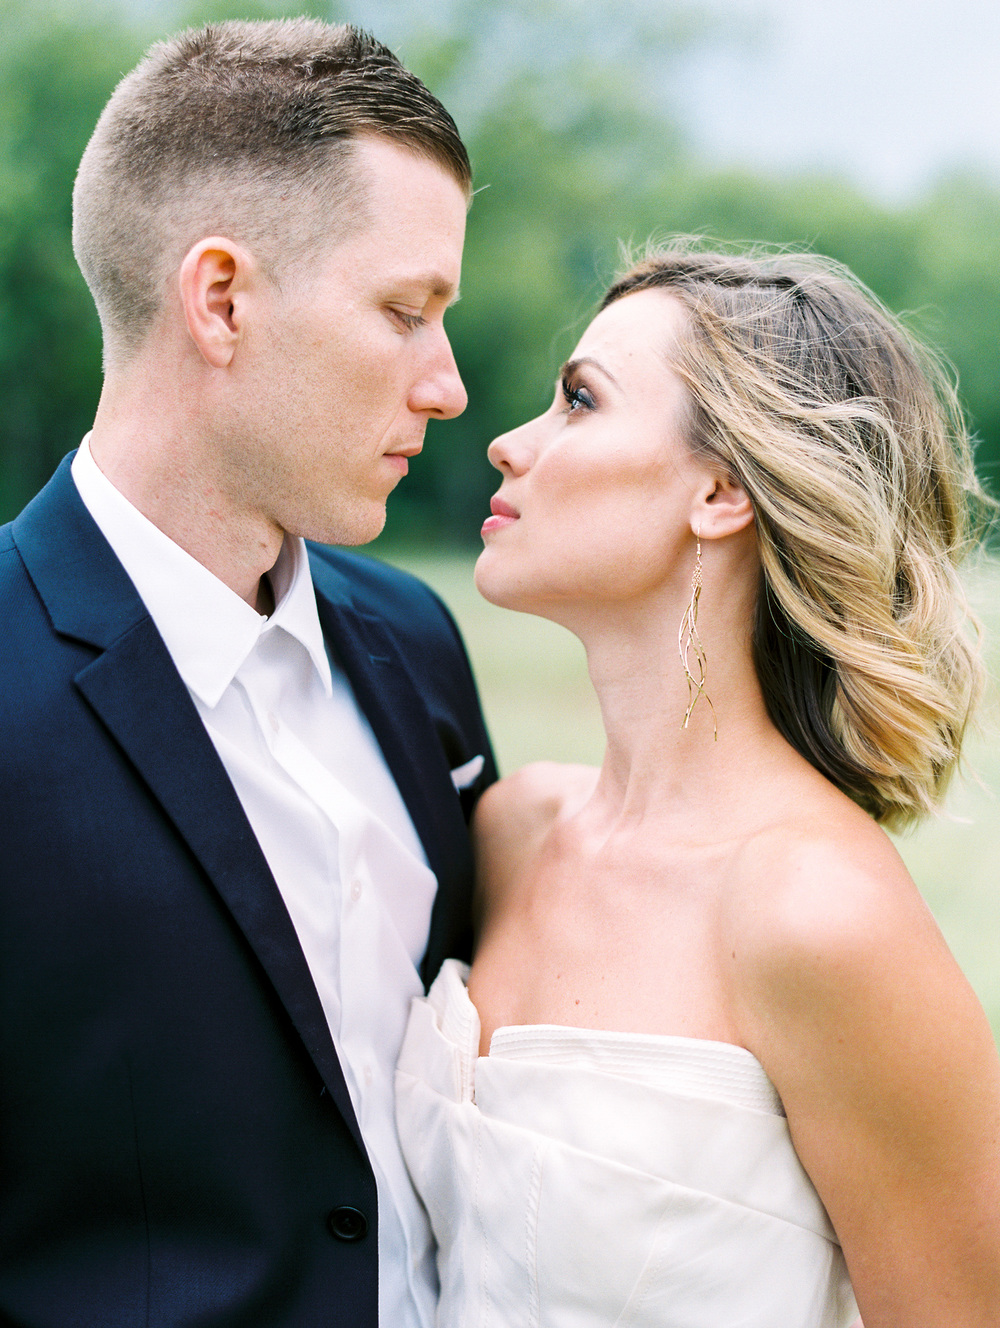 Dana-Fernandez-Photography-Houston-Wedding-Photographer-Film-100-Layer-Cake-Wedding-Inspiration-Destination-18.jpg